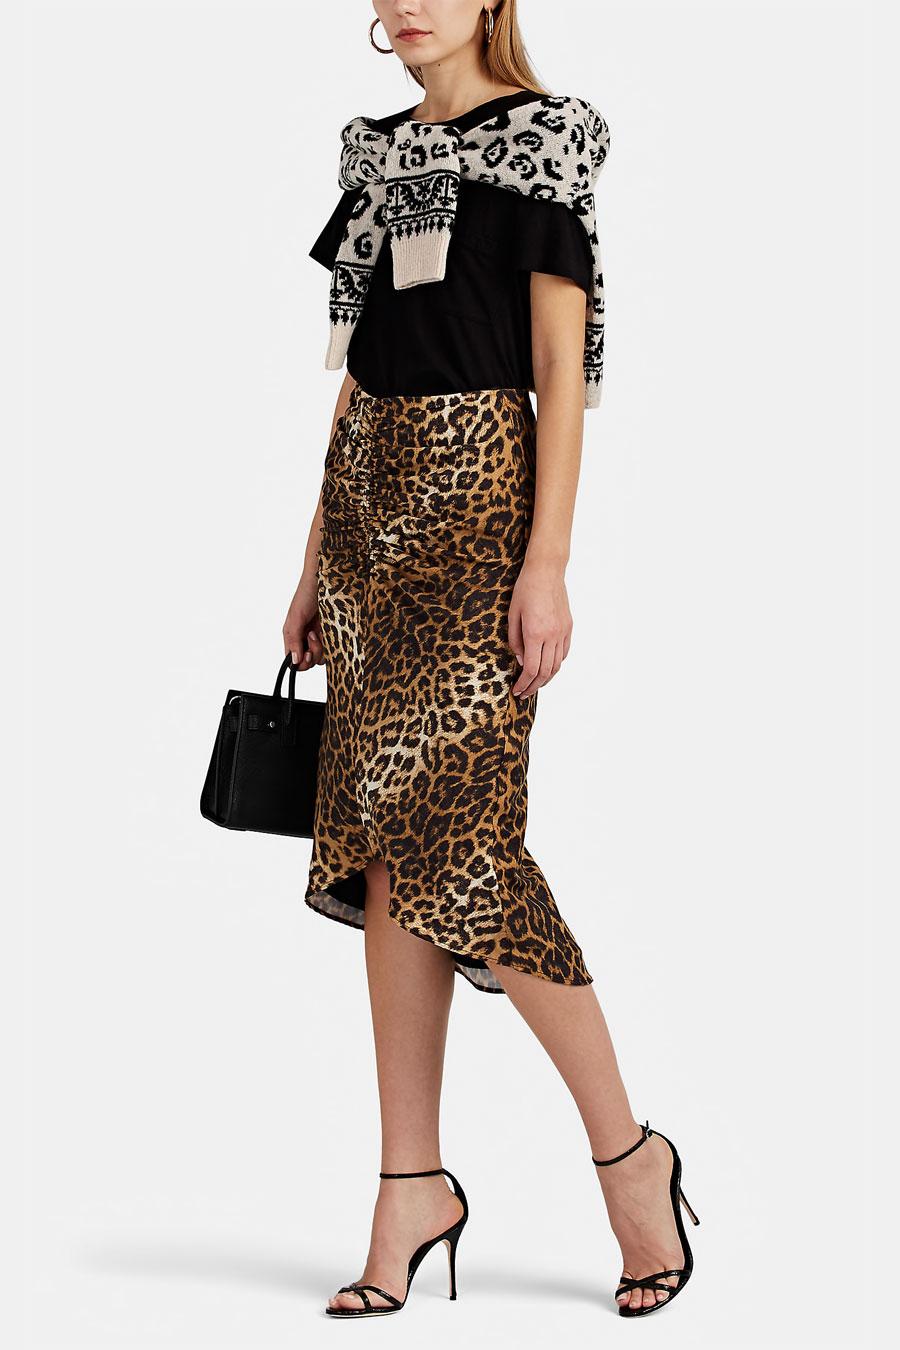 FIVESEVENTYFIVE Ruched Leopard Print Midi Skirt